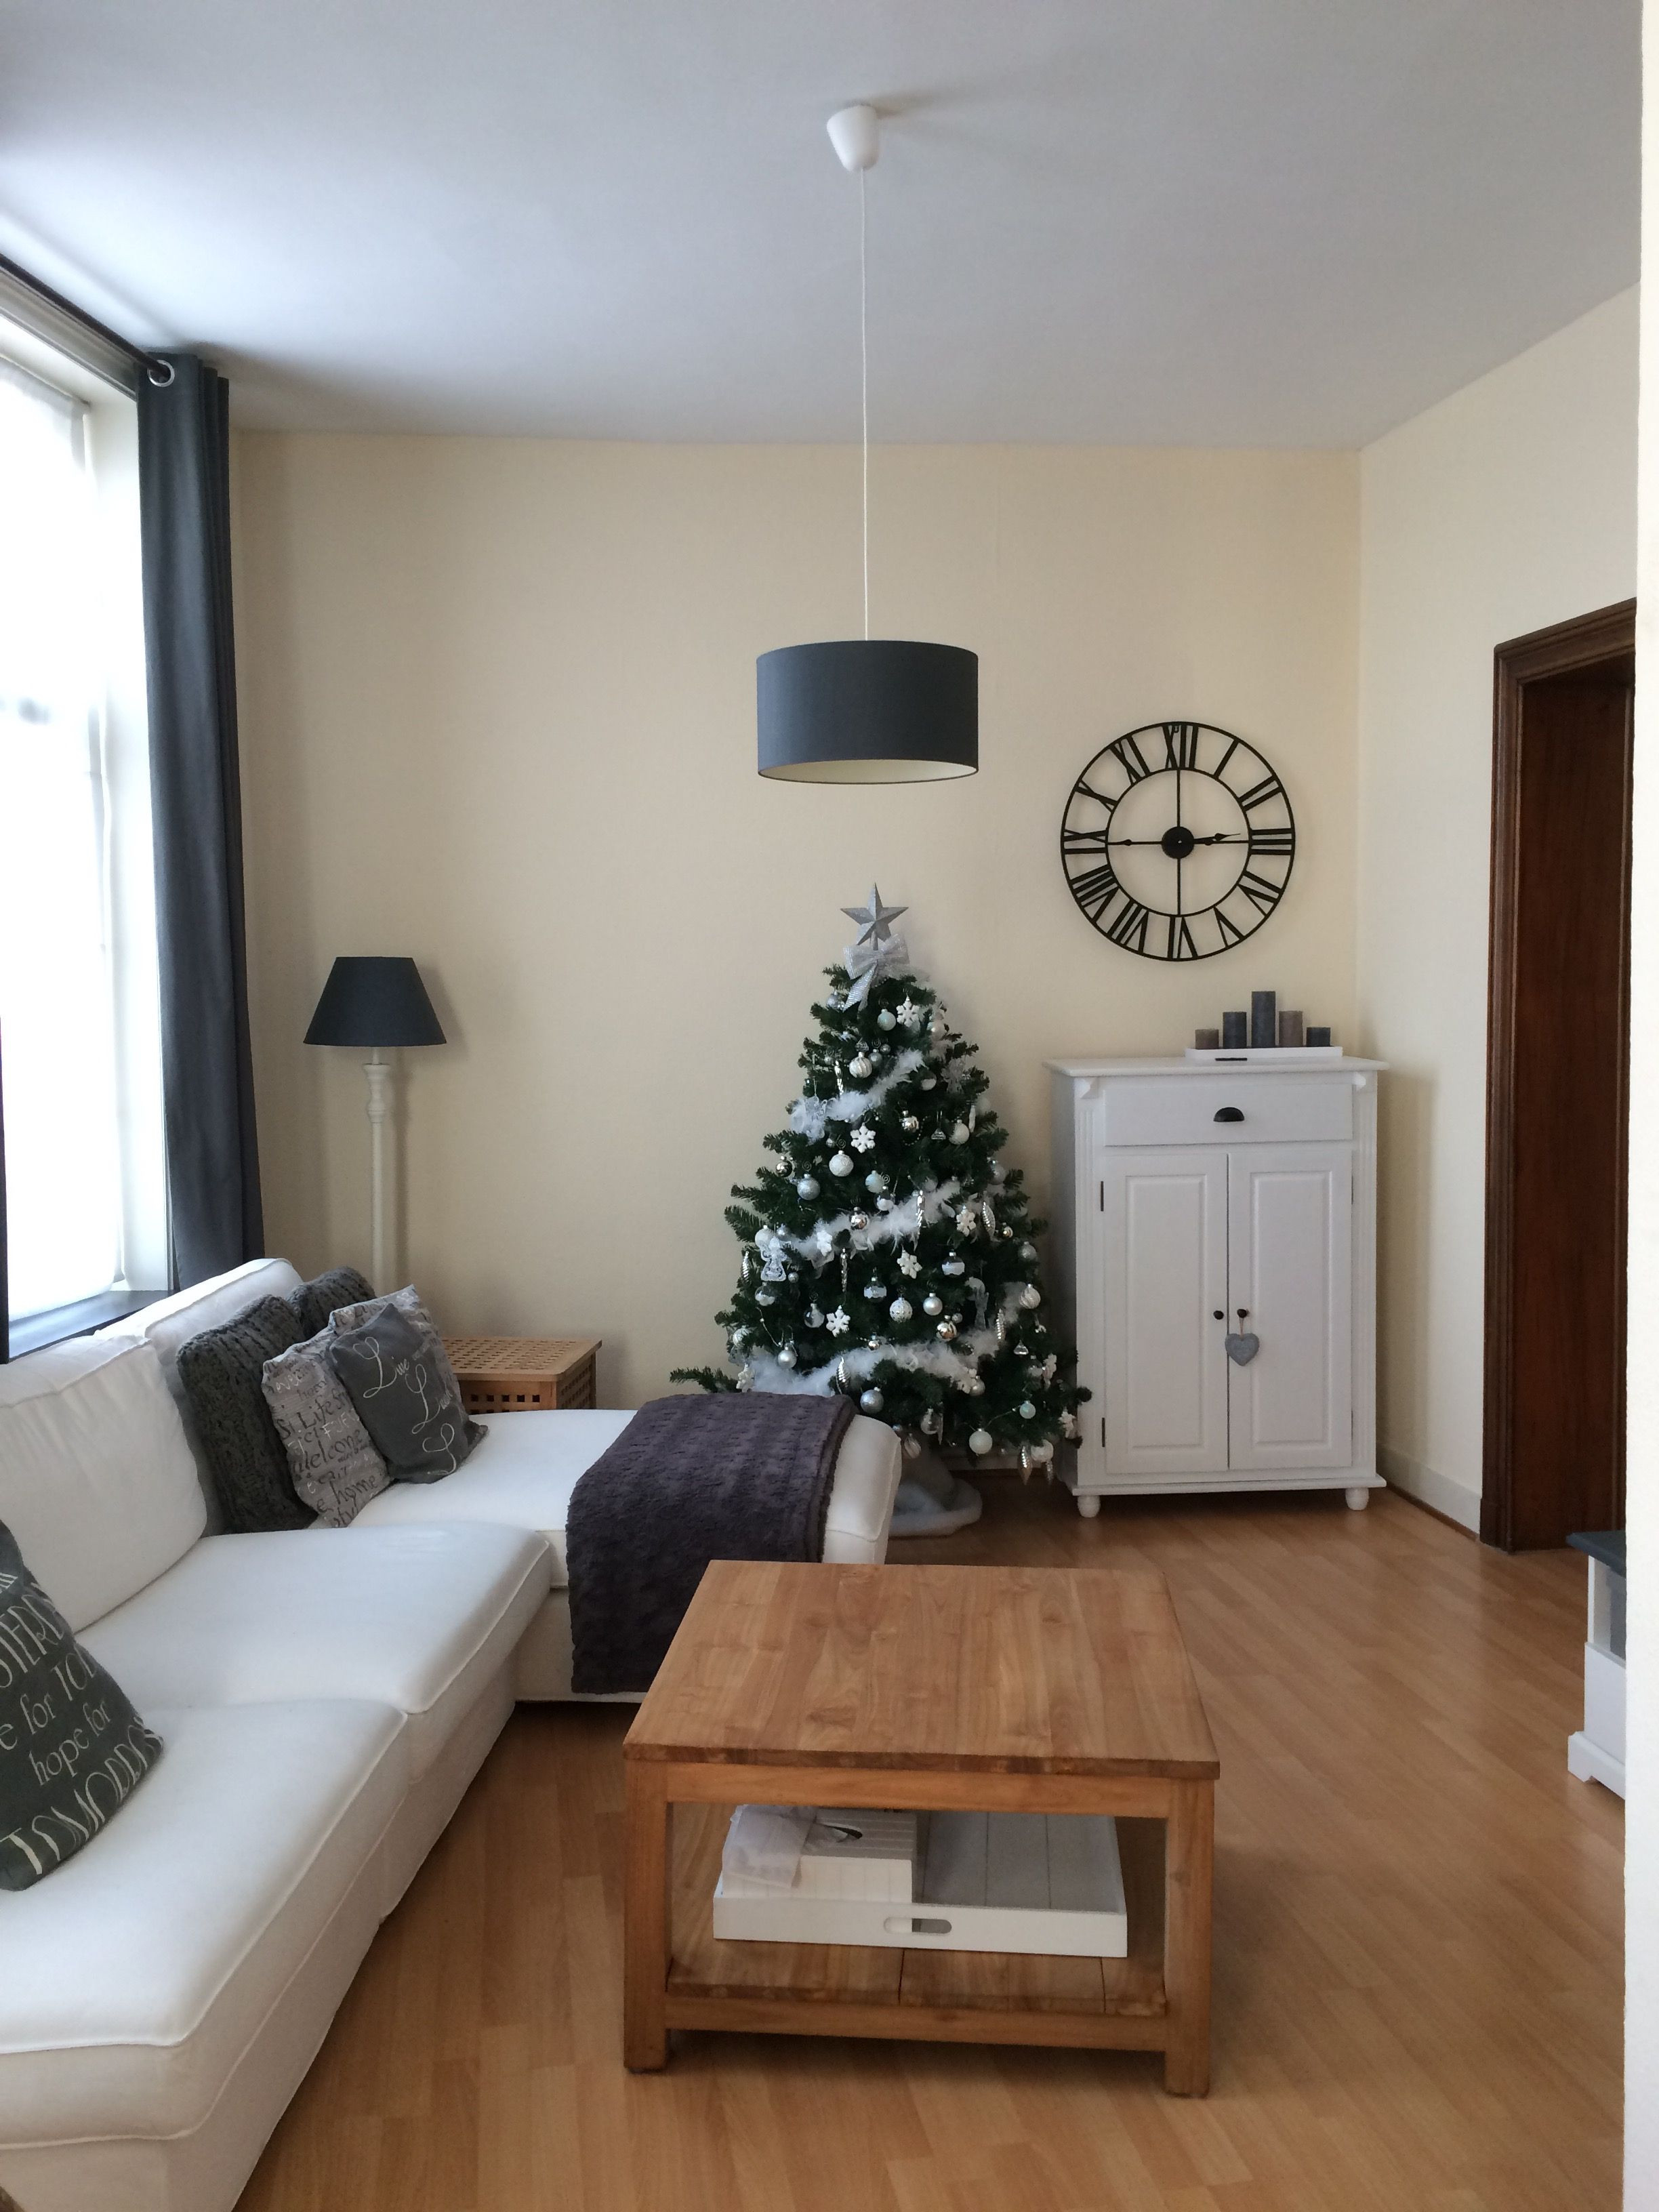 ikea miroir lumineux inspirant photographie meuble lumineux meilleur de canap u00e9 ikea kivik